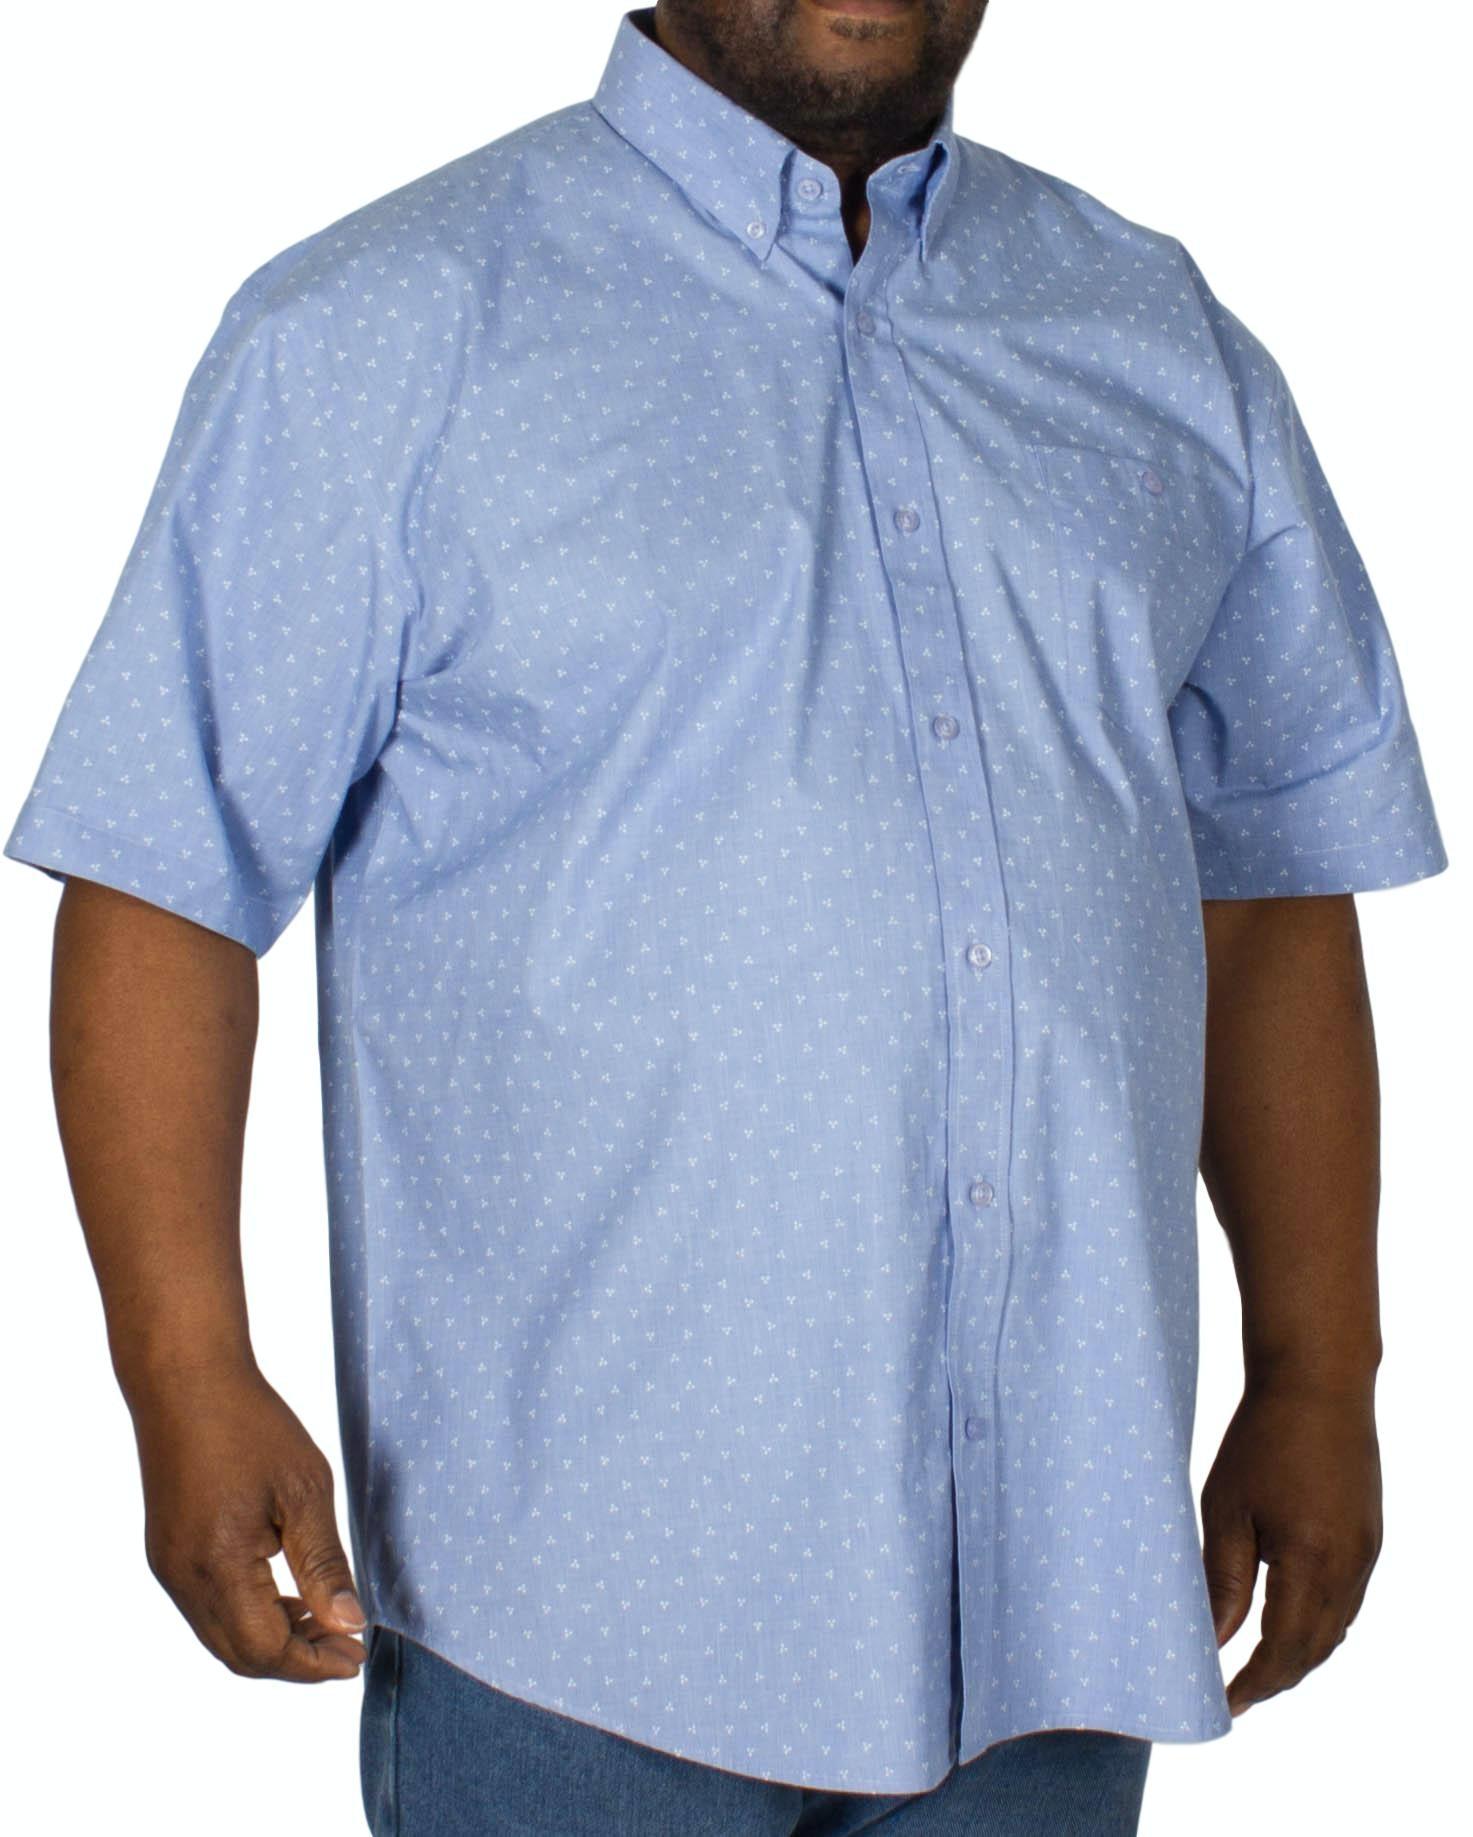 Espionage Dot Print Short Sleeve Shirt Blue